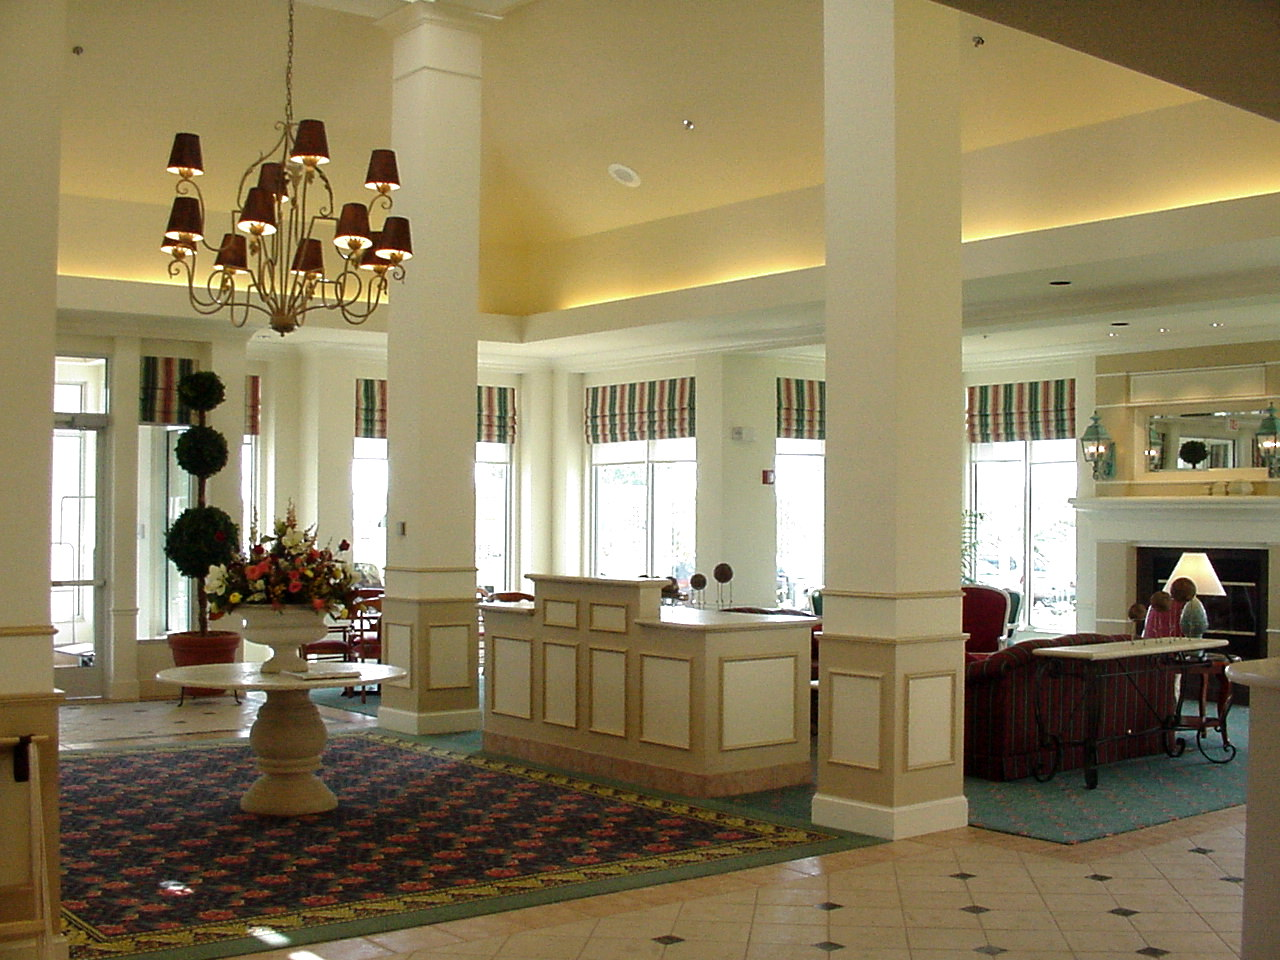 Lobby area in the Hilton Garden inn in Shoreview, MN